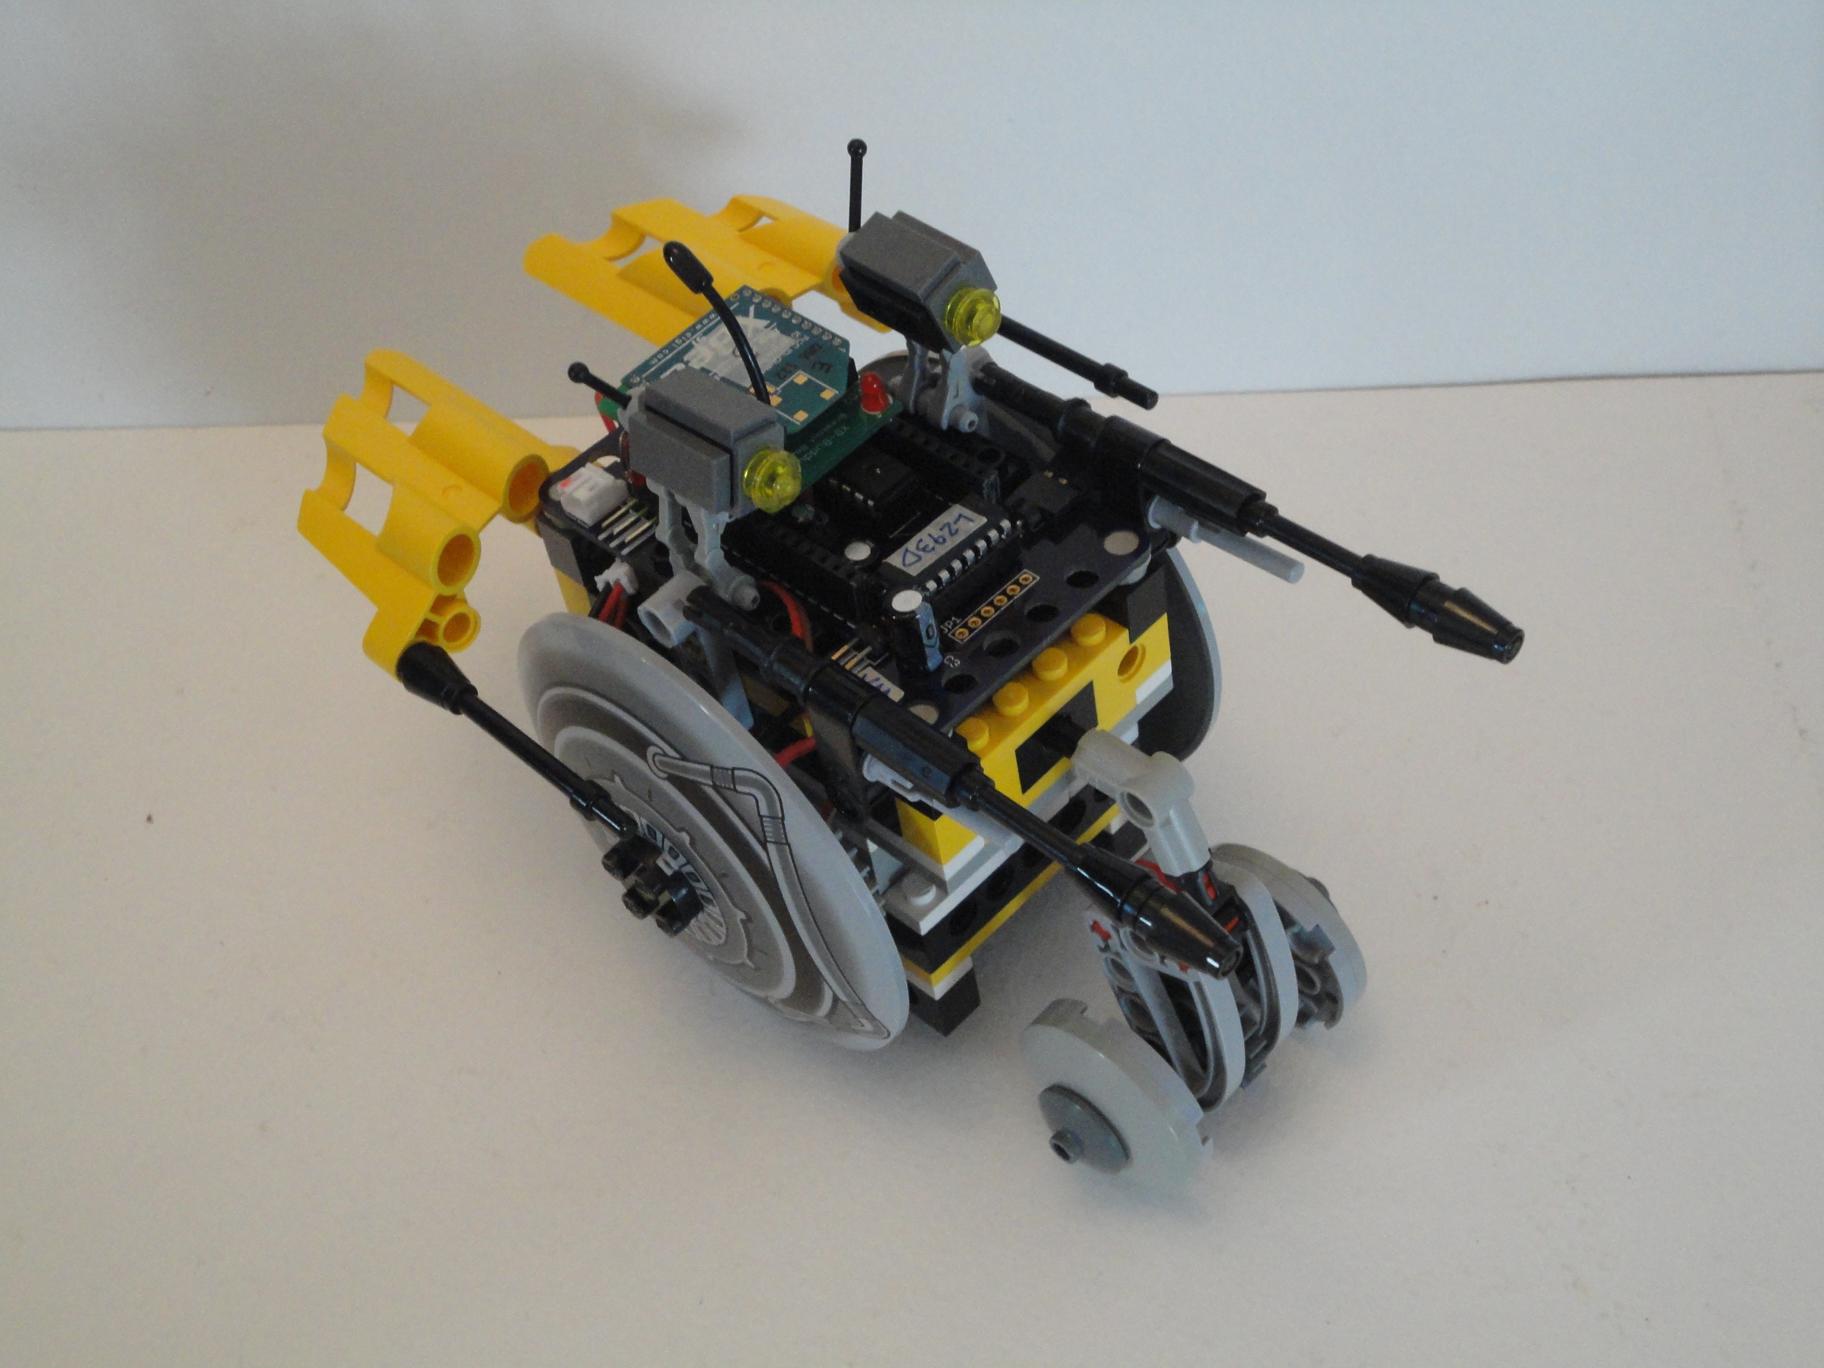 Picture of R/C LEGO 'Velocipede' Droid